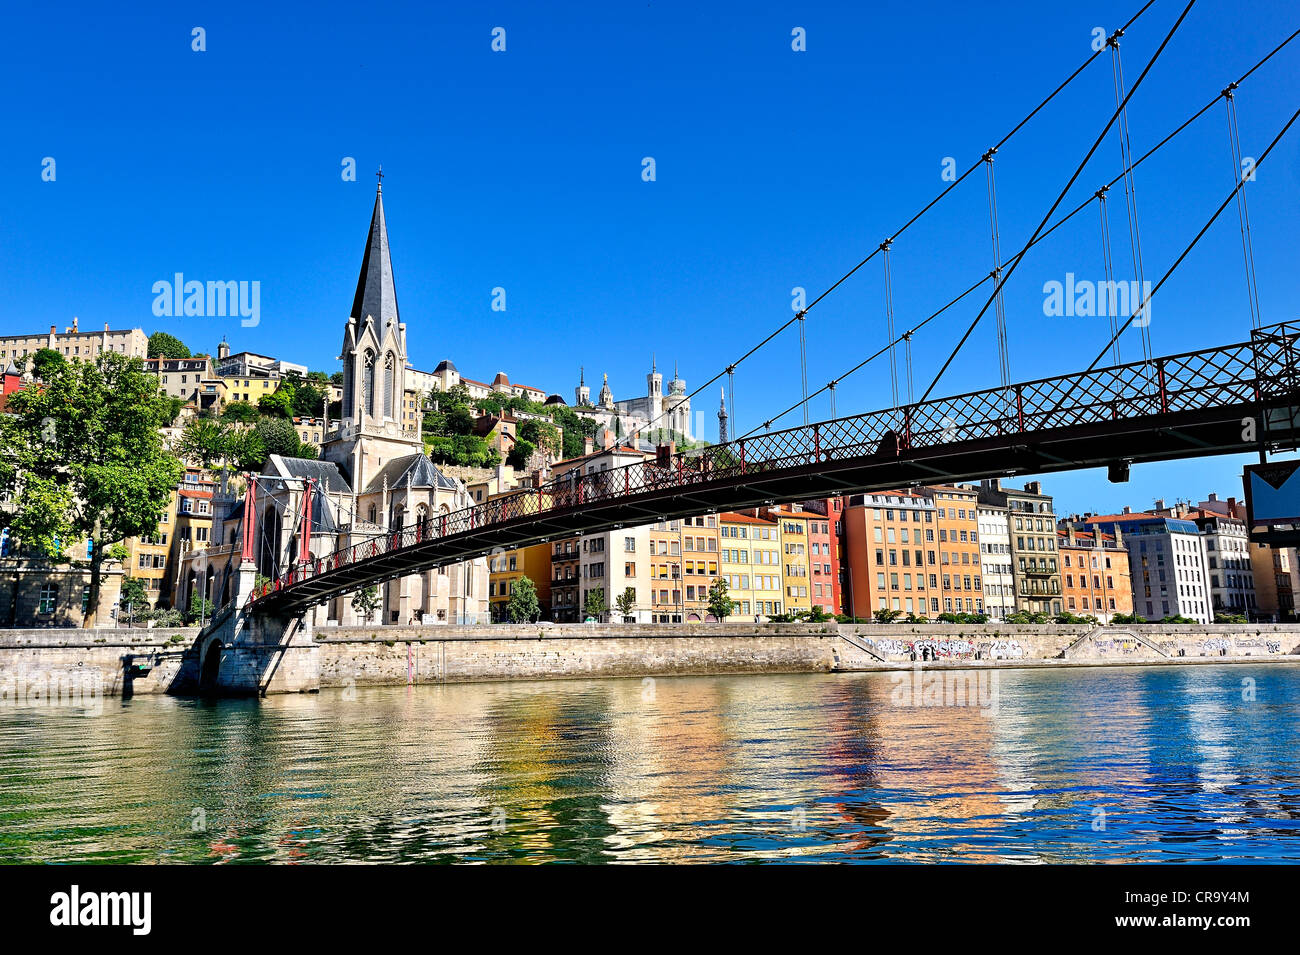 Pedestrian passerelle over the river Saone, Lyon, France. - Stock Image